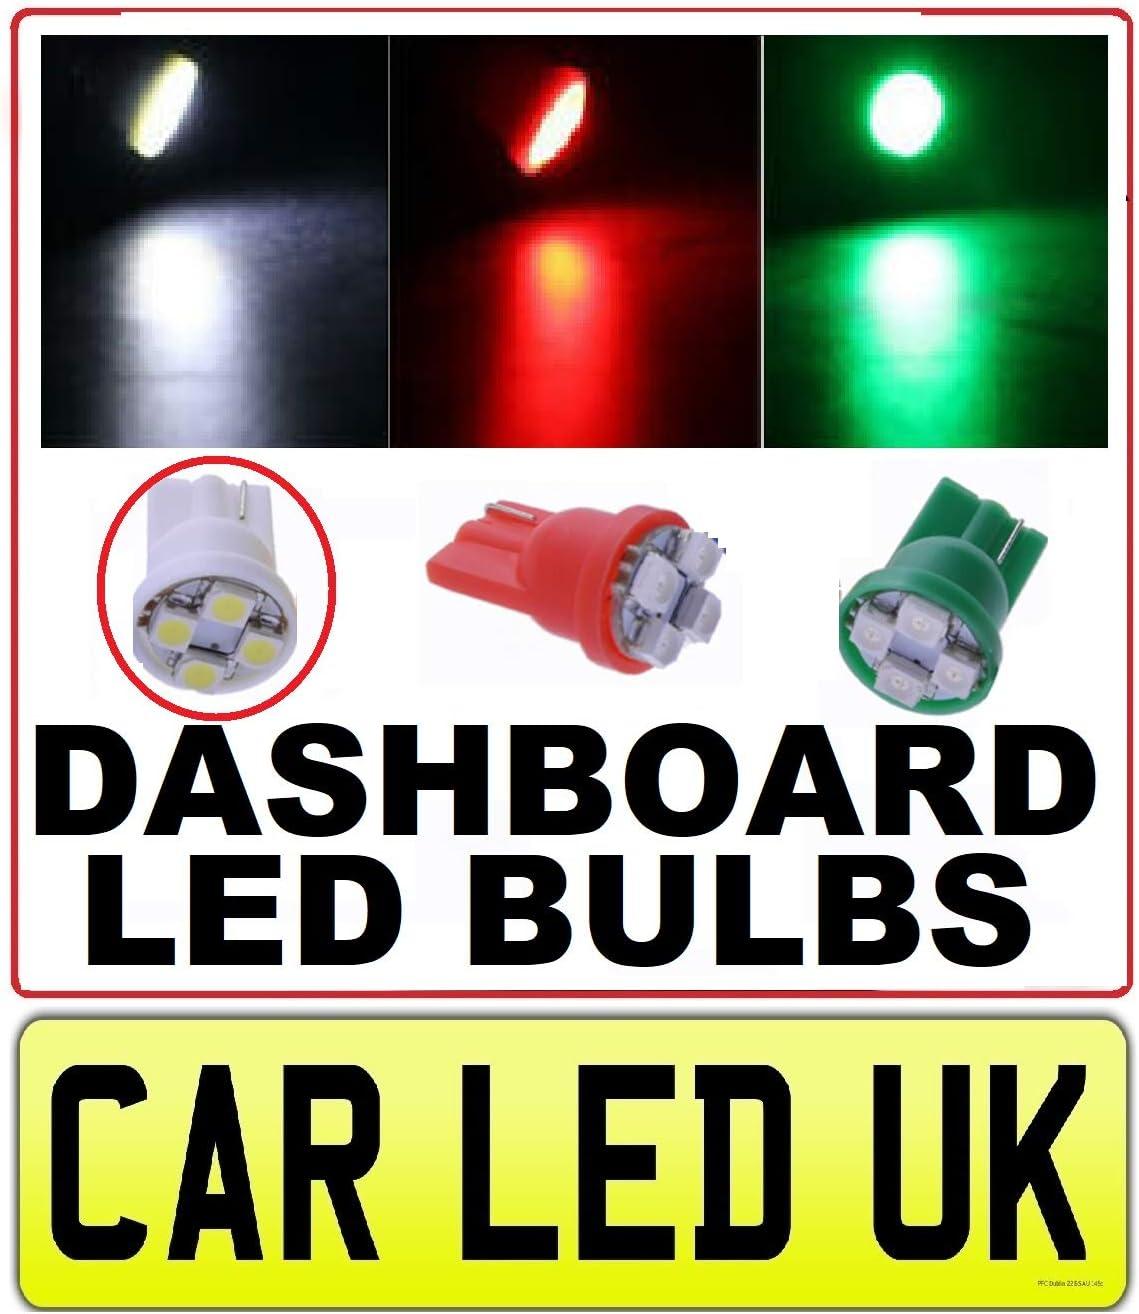 Car-LED UK Green 5 Pcs T10 168 194 501 W5W  LED INSTRUMENT PANEL DASHBOARD BULB  Upgrade to LED /& Enhance Your Dashboard